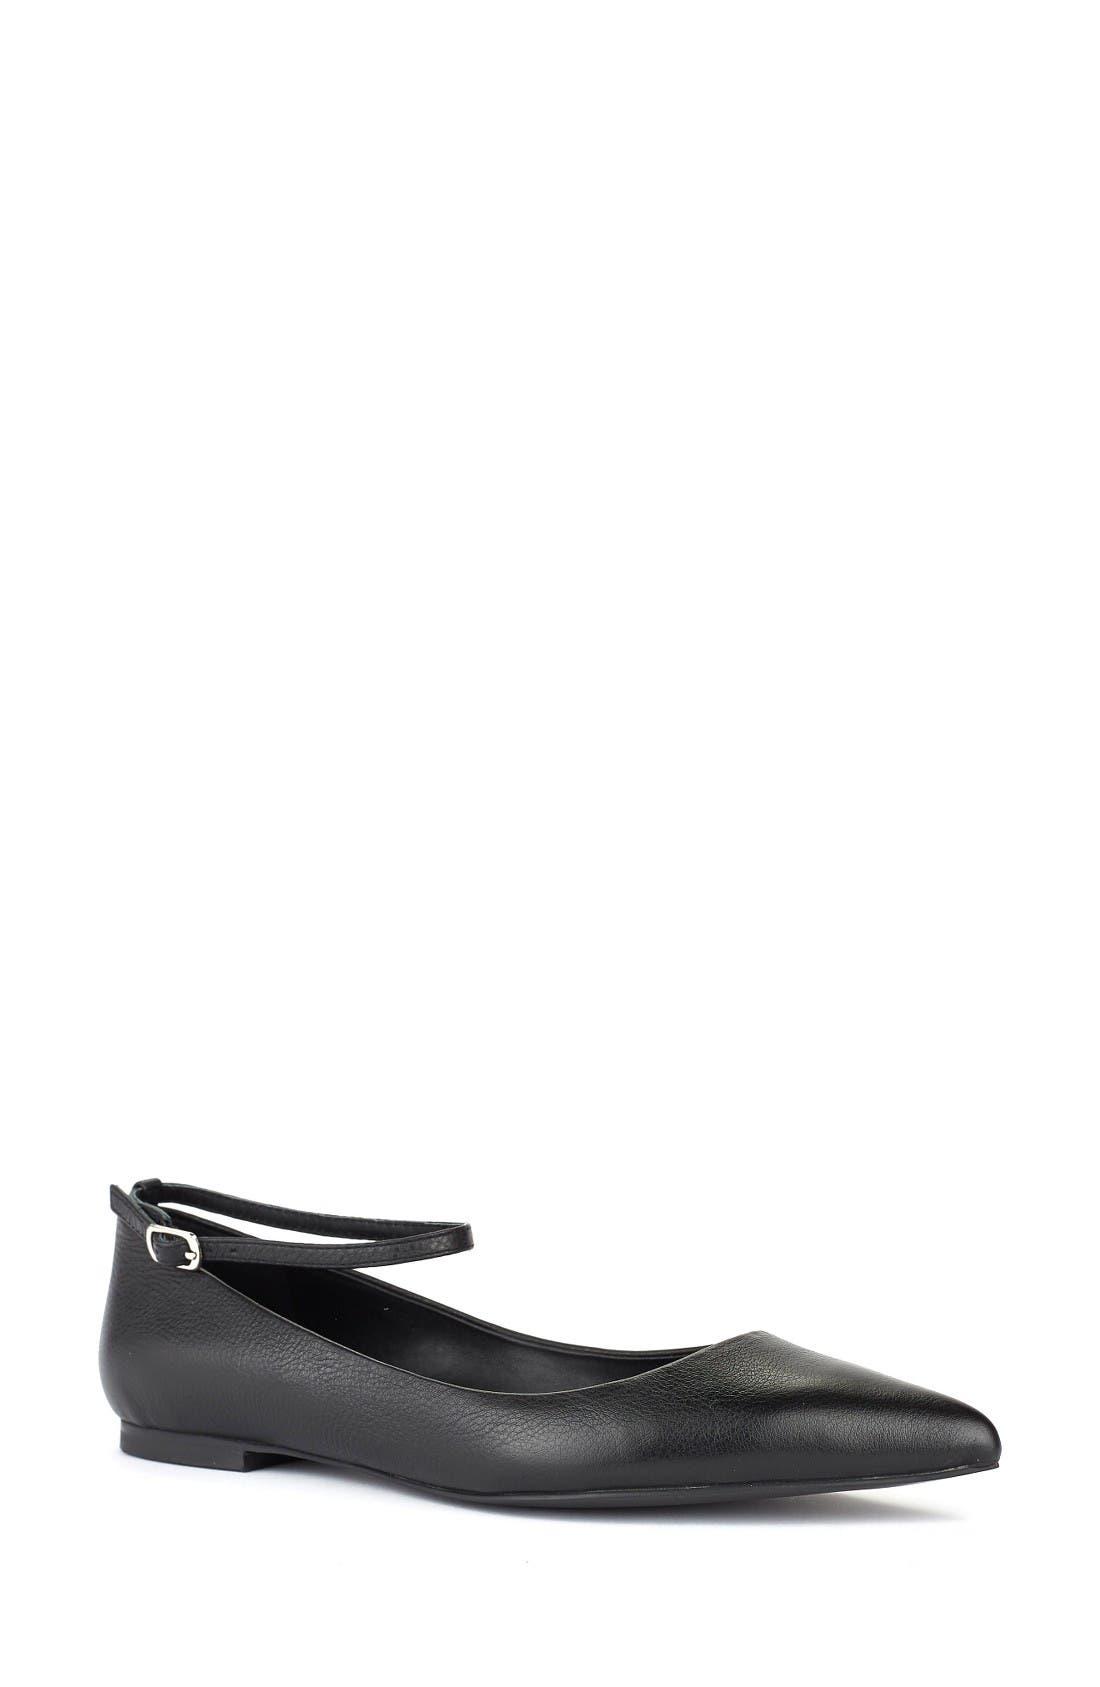 Shoes of Prey Ankle Strap Flat (Women)